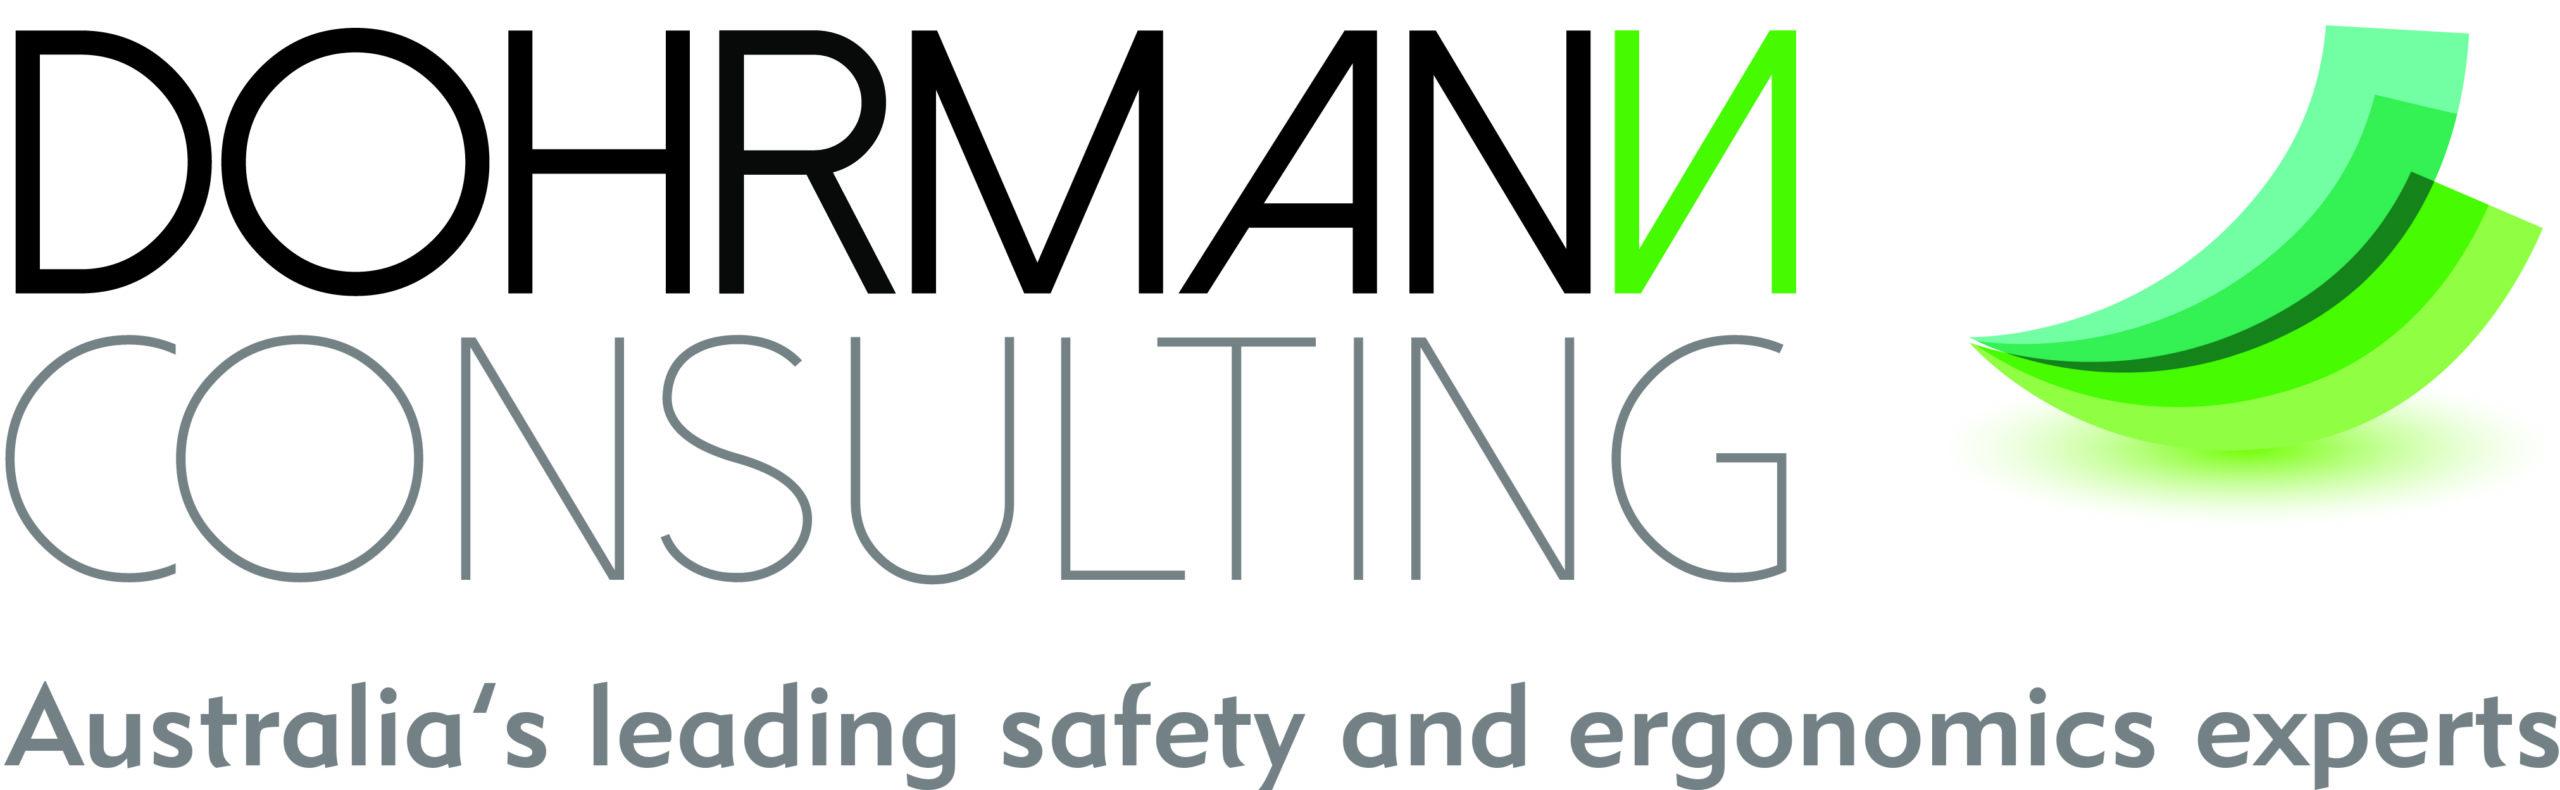 Dohrmann Consulting